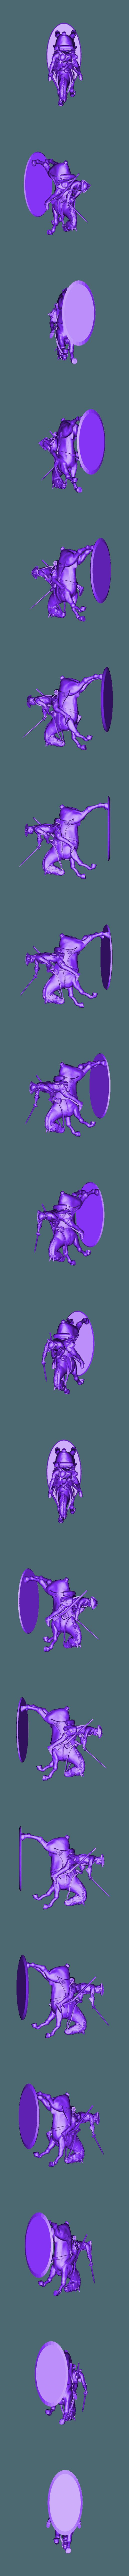 Brit_Dragoons_AttackJump_C.stl Download free STL file Free British Dragoon – Seven Years War – French Indian Wars • 3D print model, Lukas_Fischer